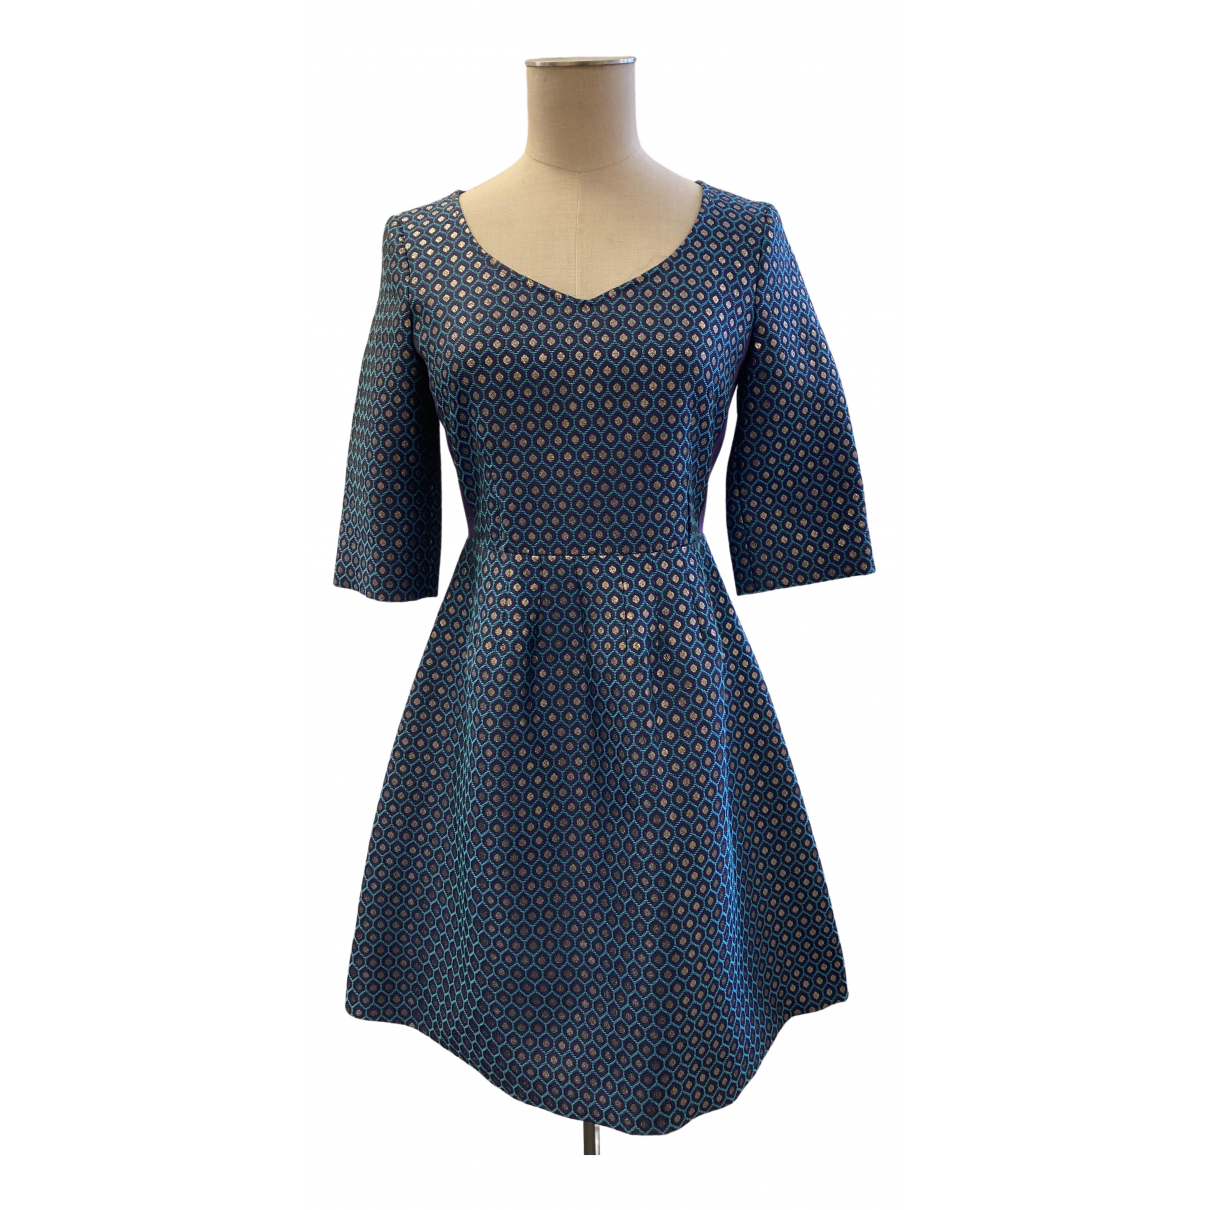 Max & Co \N Kleid in  Bunt Polyester